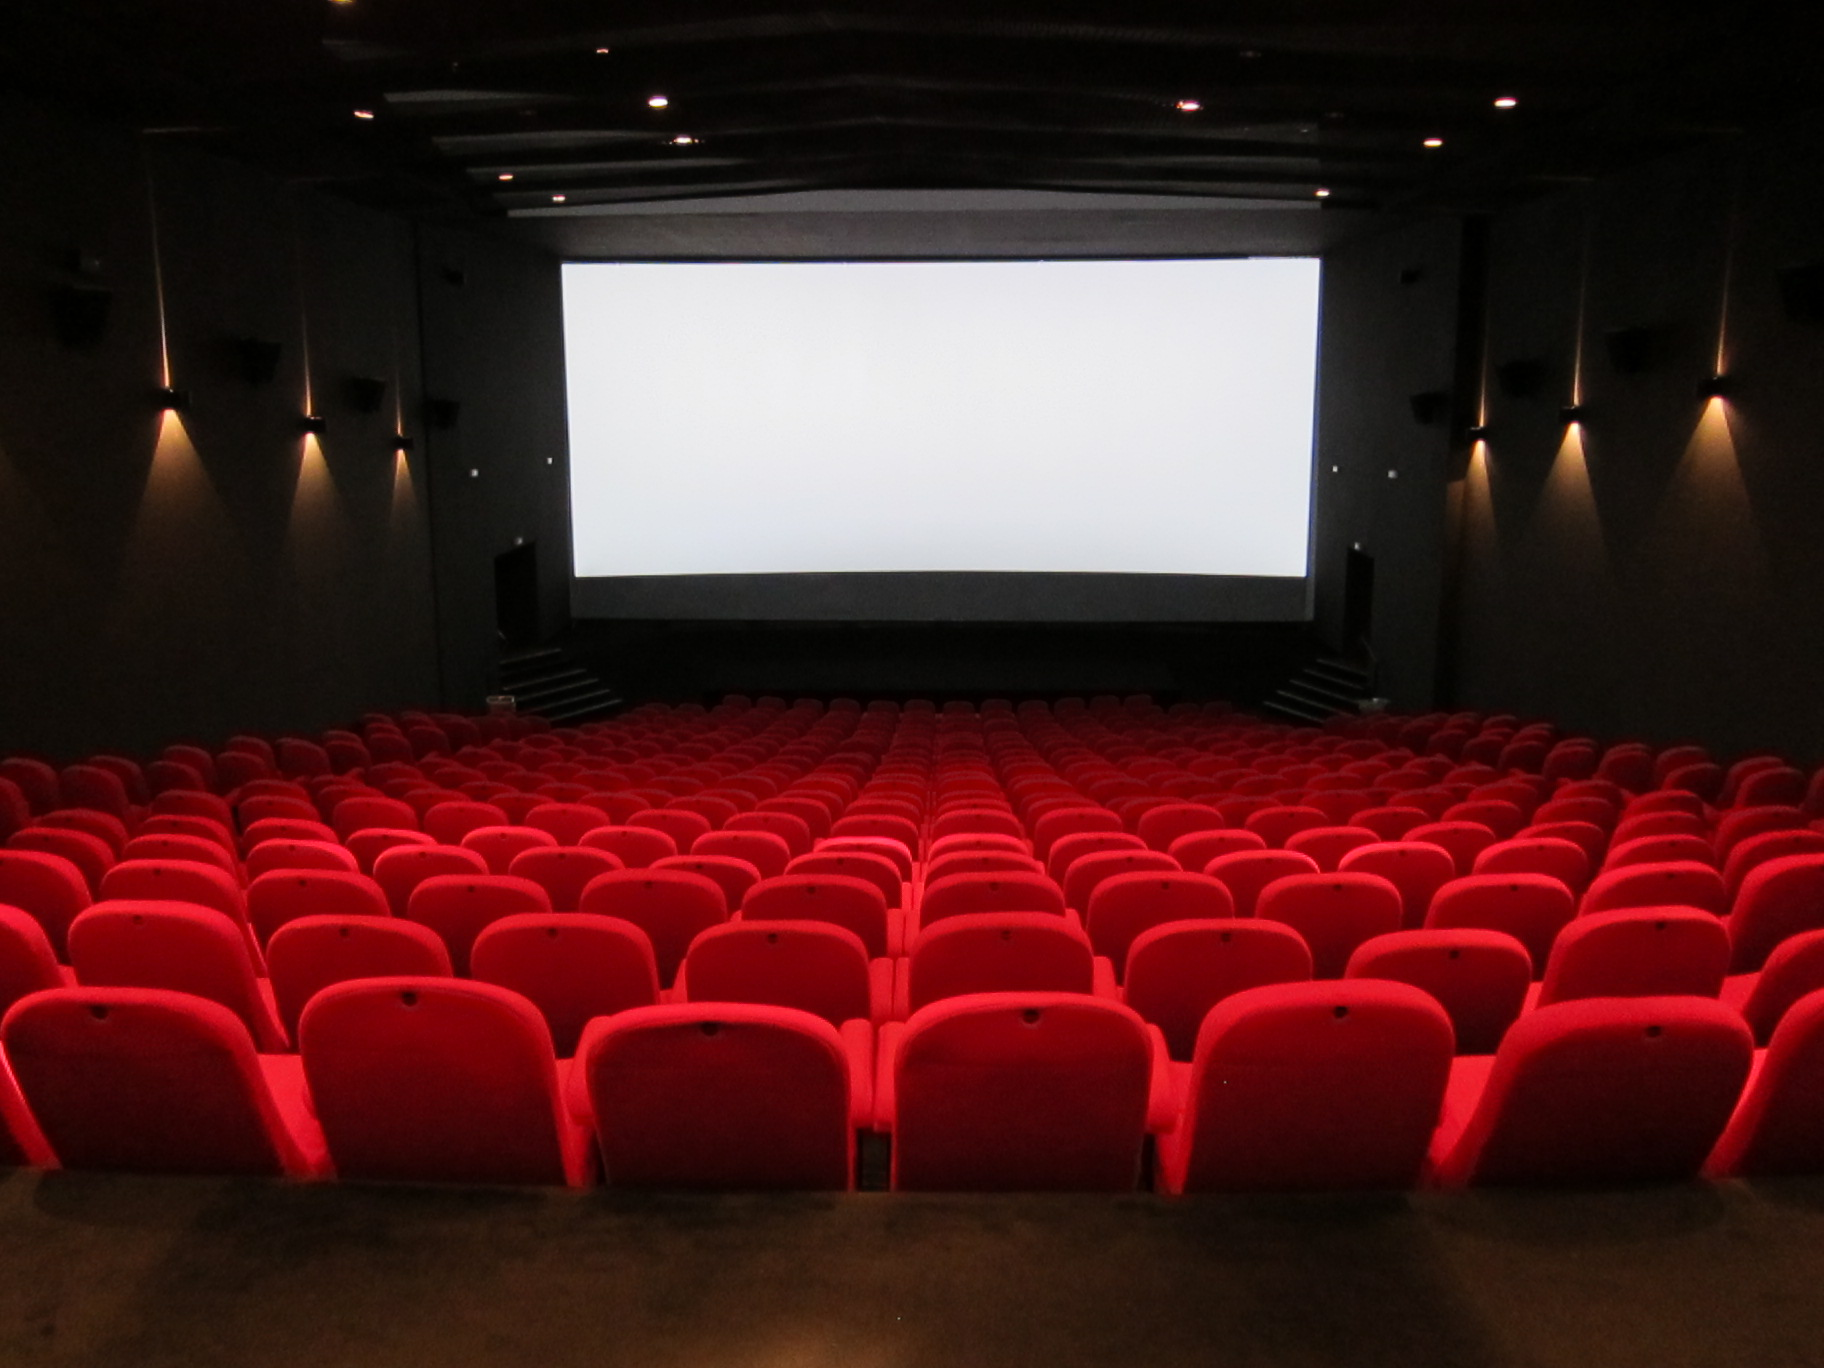 émue - [CINEMA DU PAUVRE] Salle 1 7403-cinema